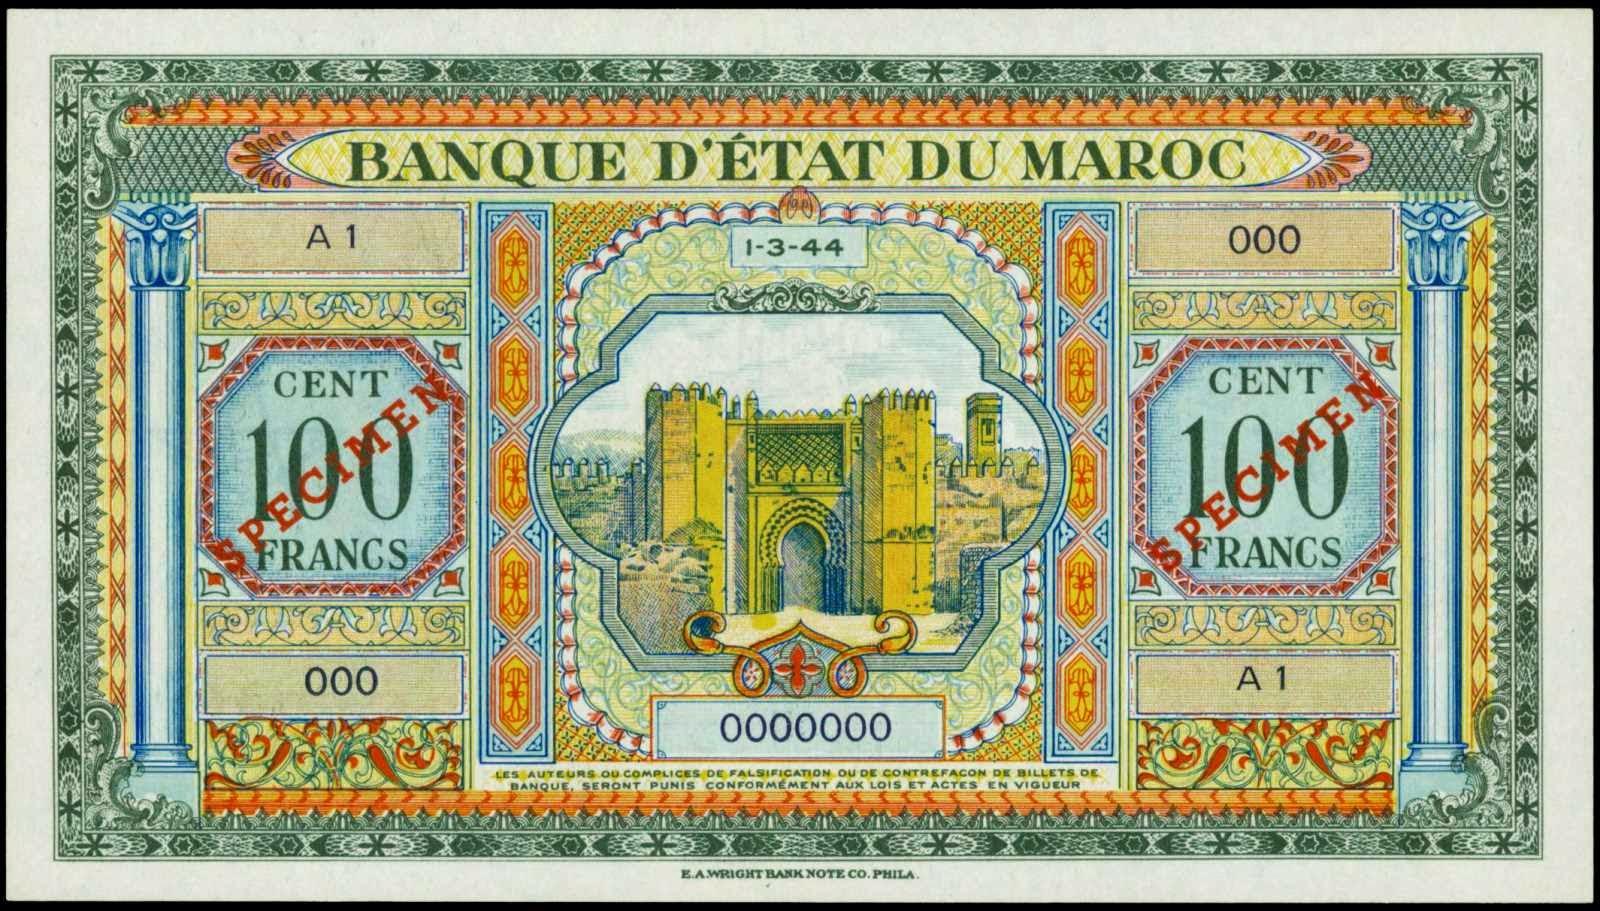 Morocco 100 Francs banknote 1944 Bab el-Mahrouk gate Fez